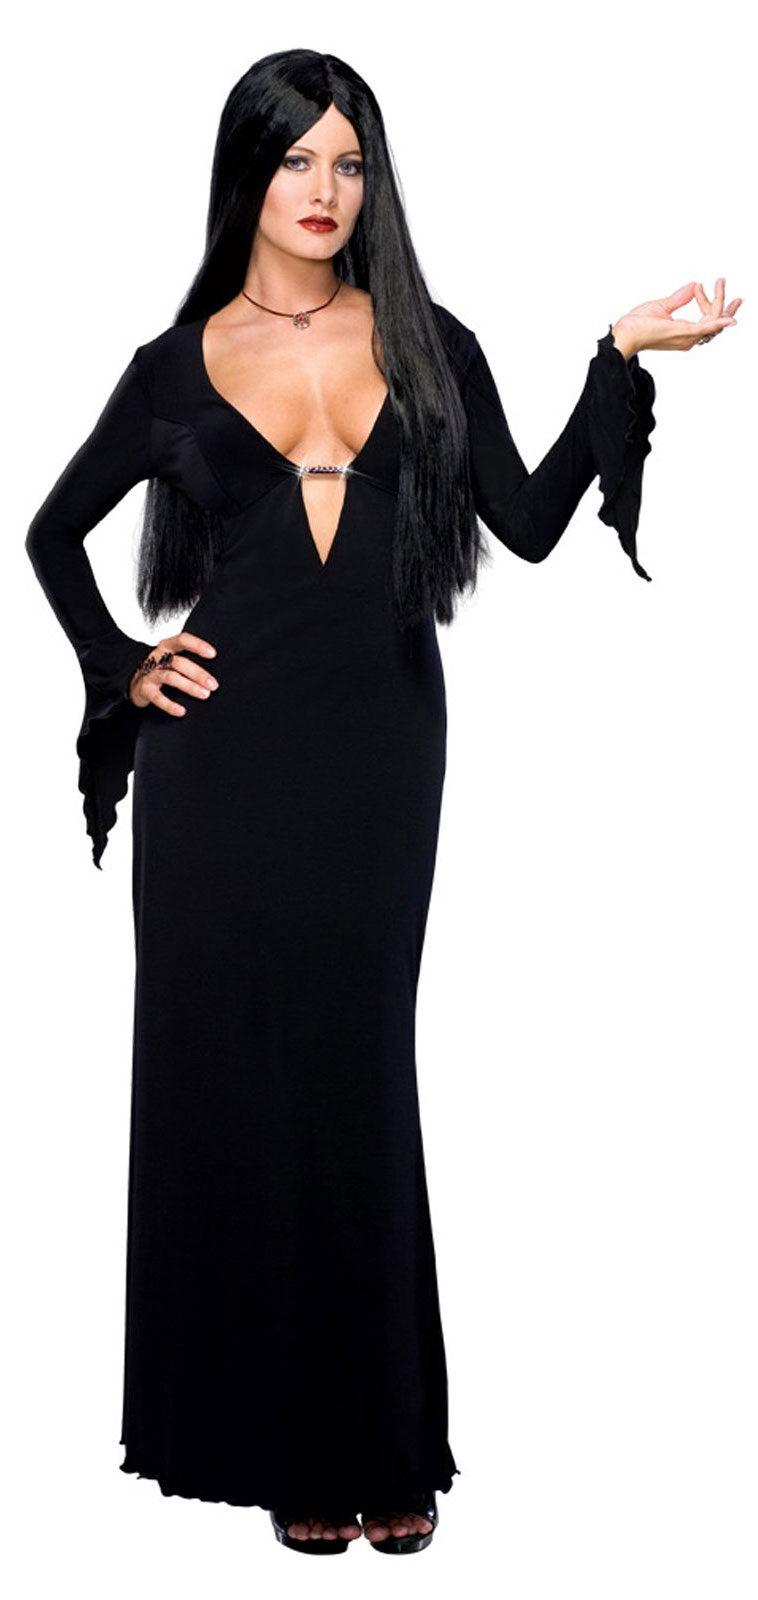 morticia addams sexy gothic costume mr costumes. Black Bedroom Furniture Sets. Home Design Ideas